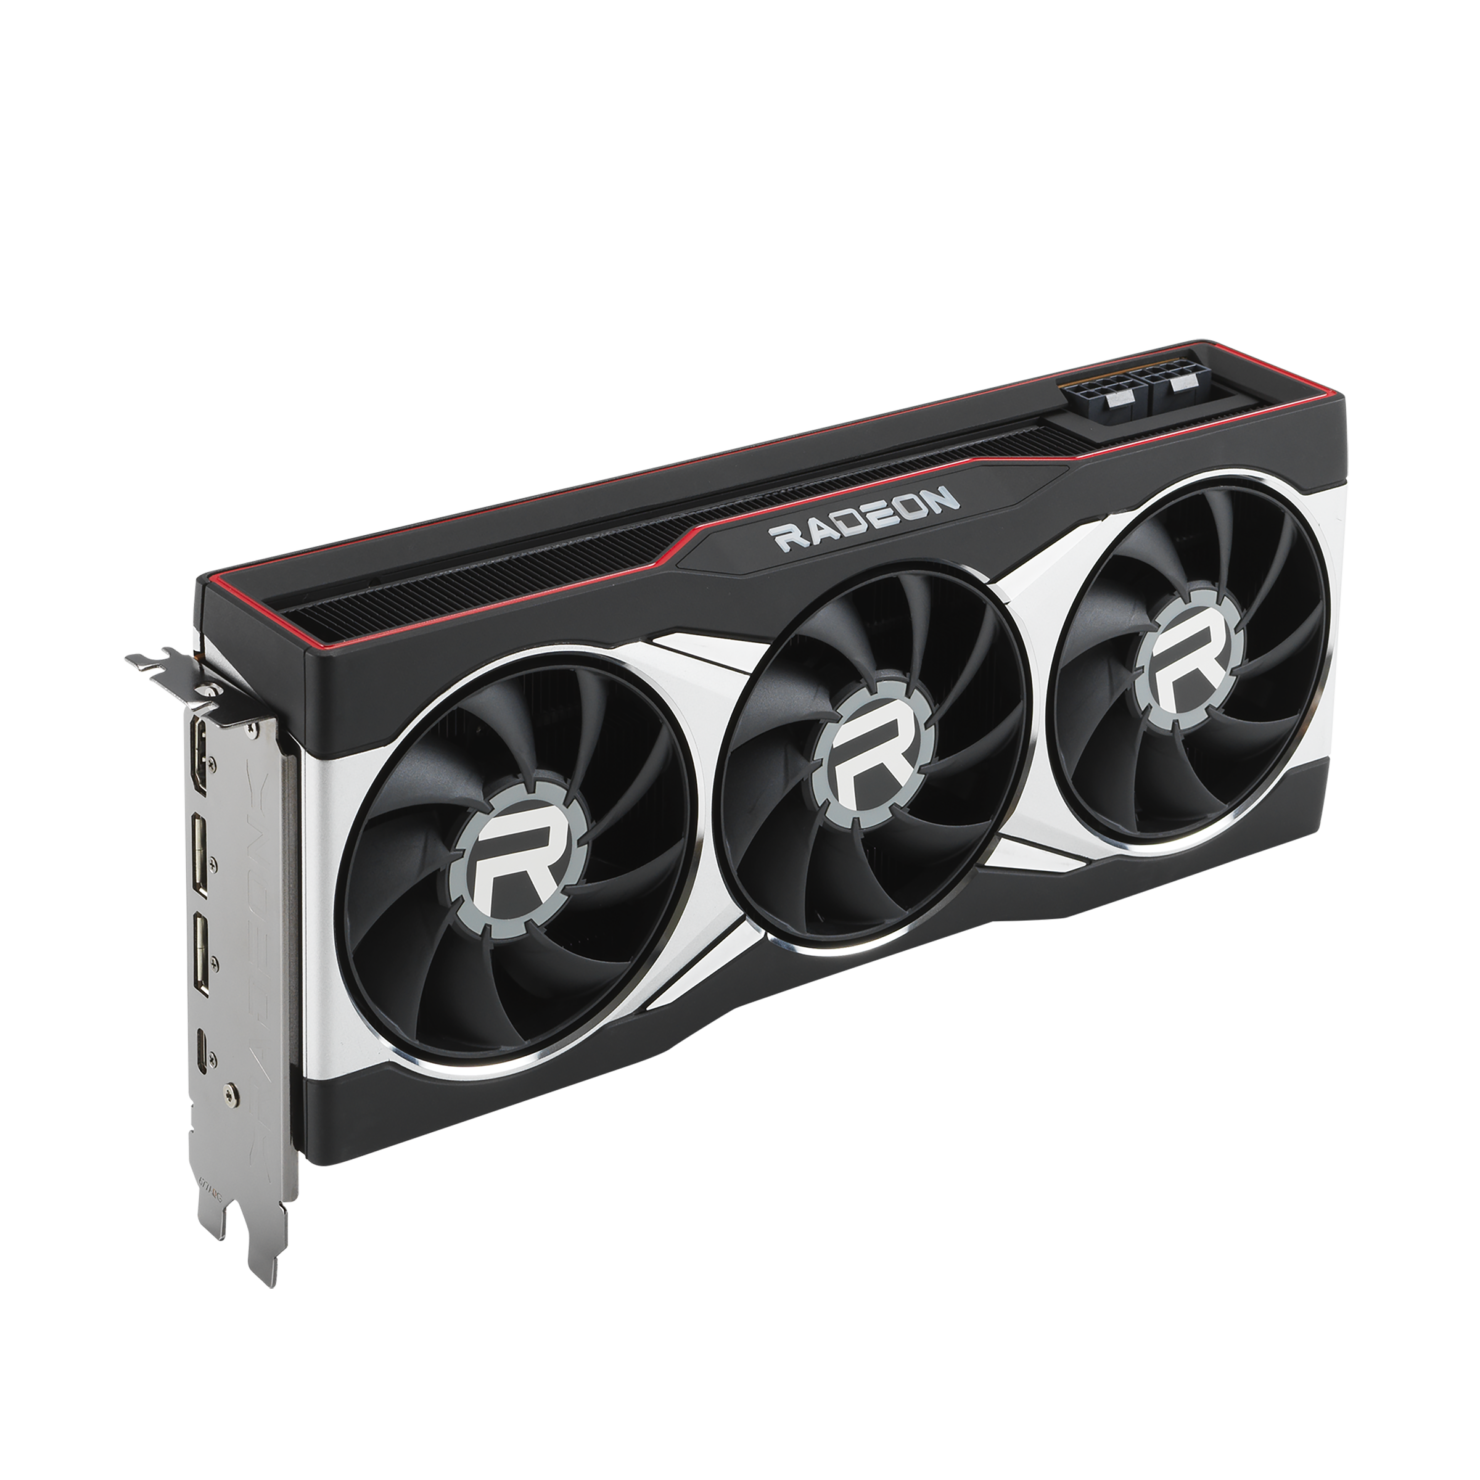 asus-radeon-rx-6900-xt-graphics-card_7